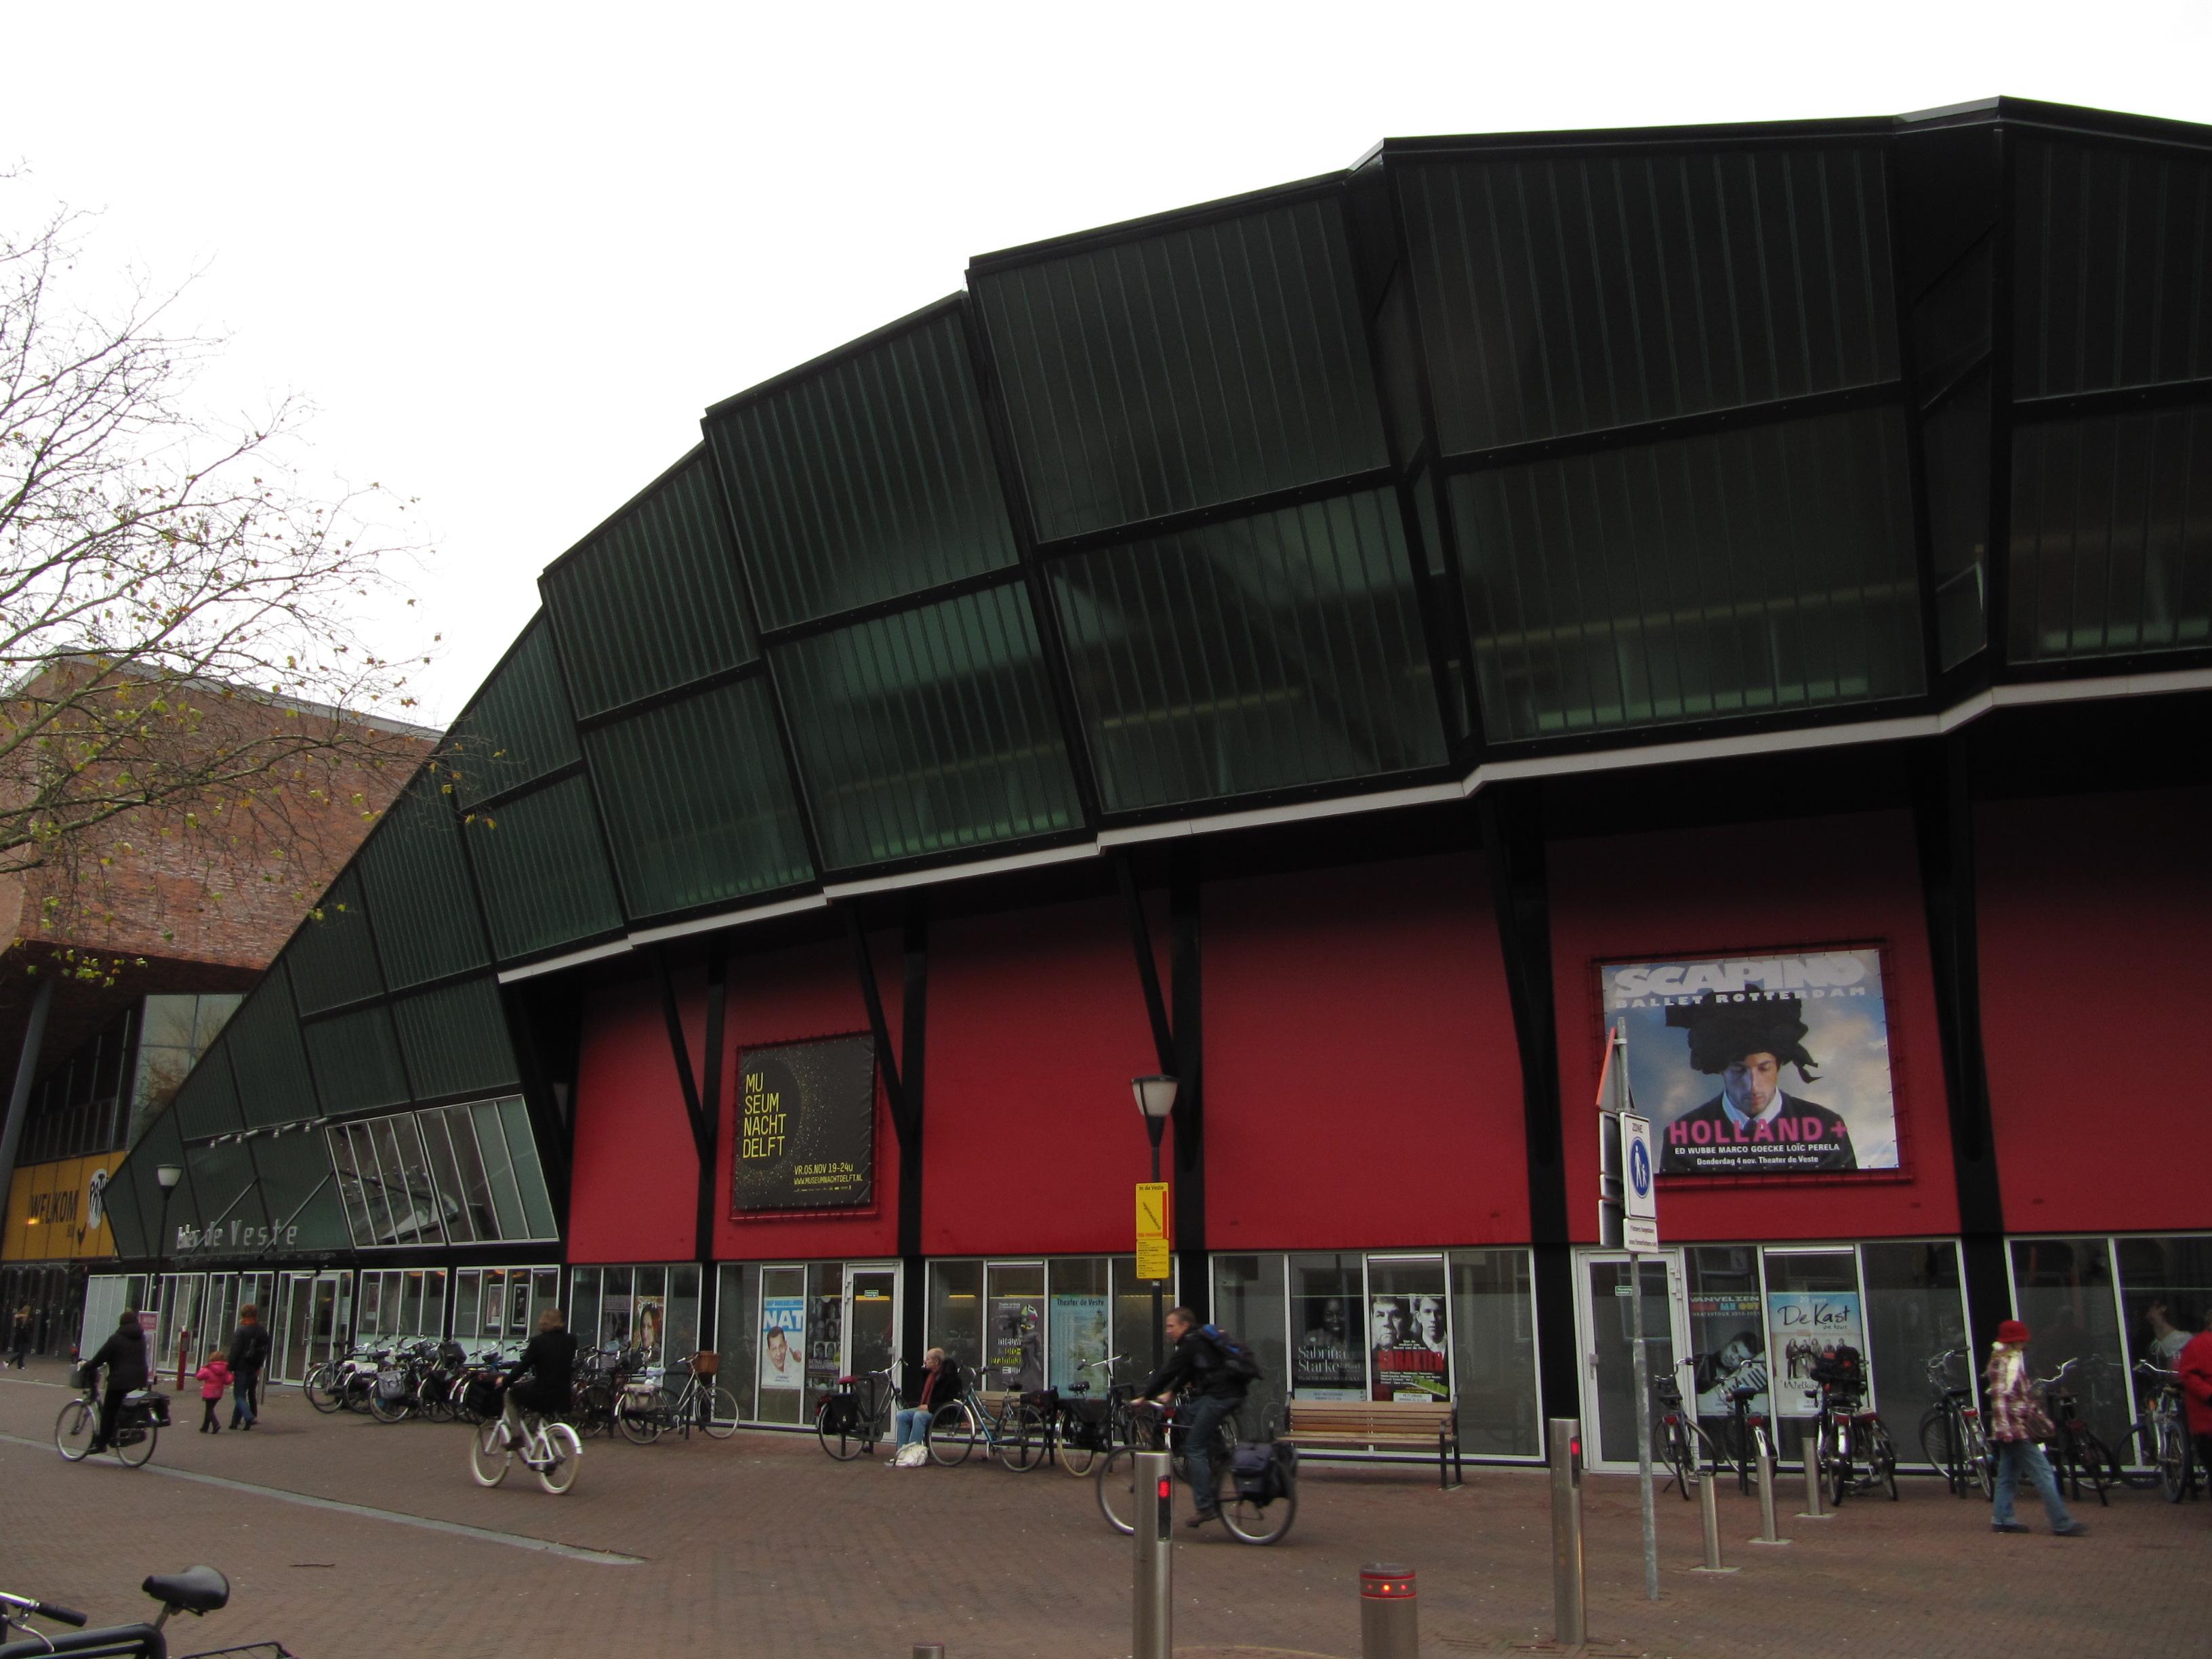 Theater de Veste - Delft.jpg